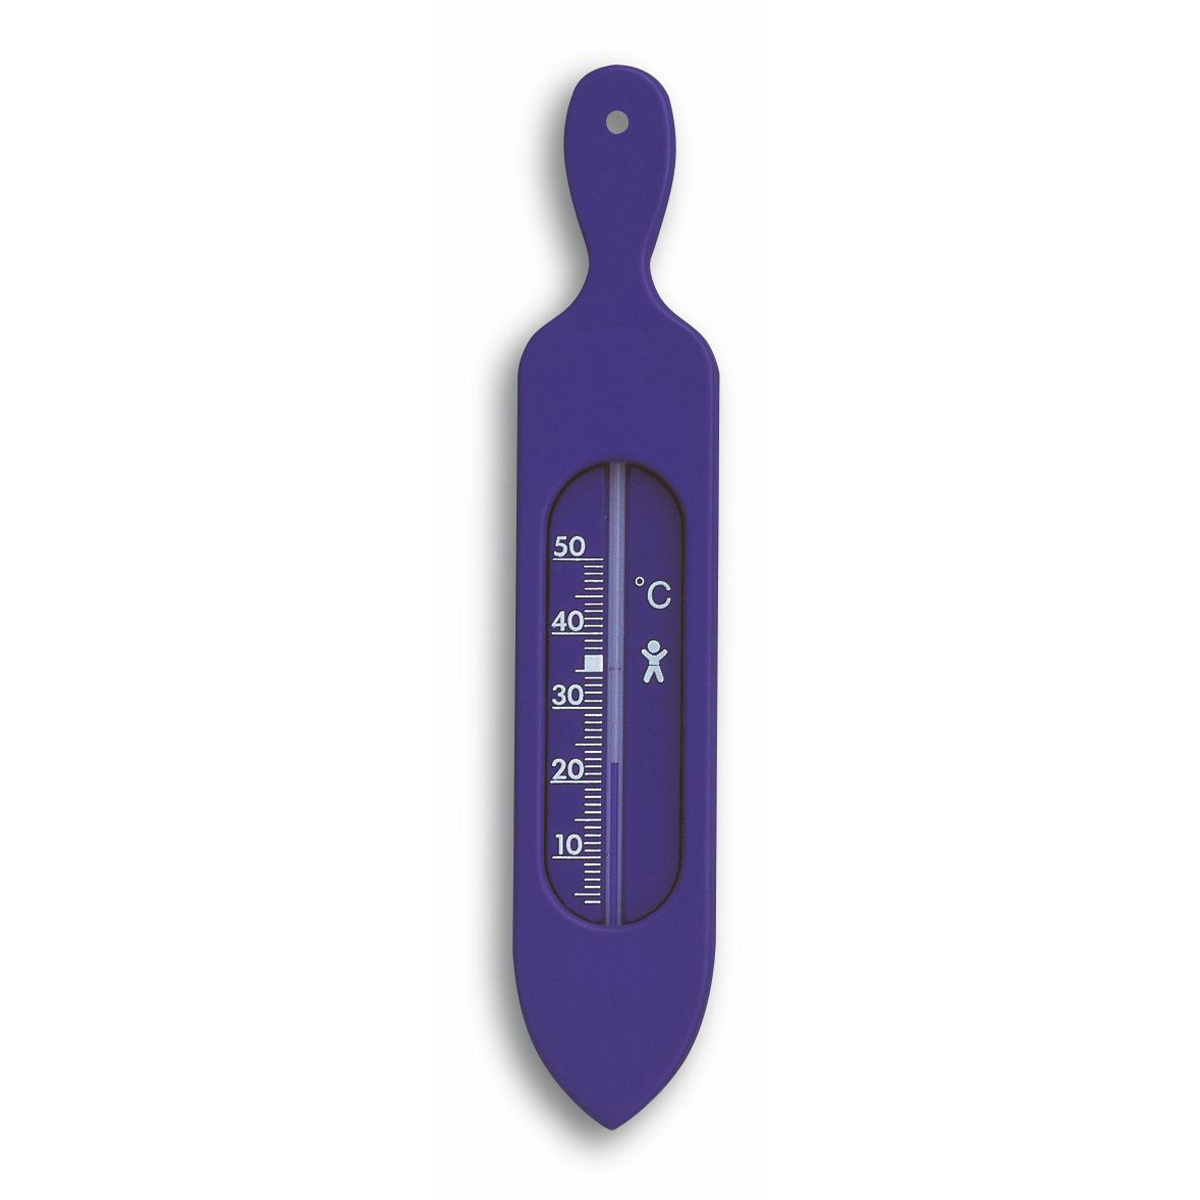 14-3018-06-analoges-badethermometer-1200x1200px.jpg